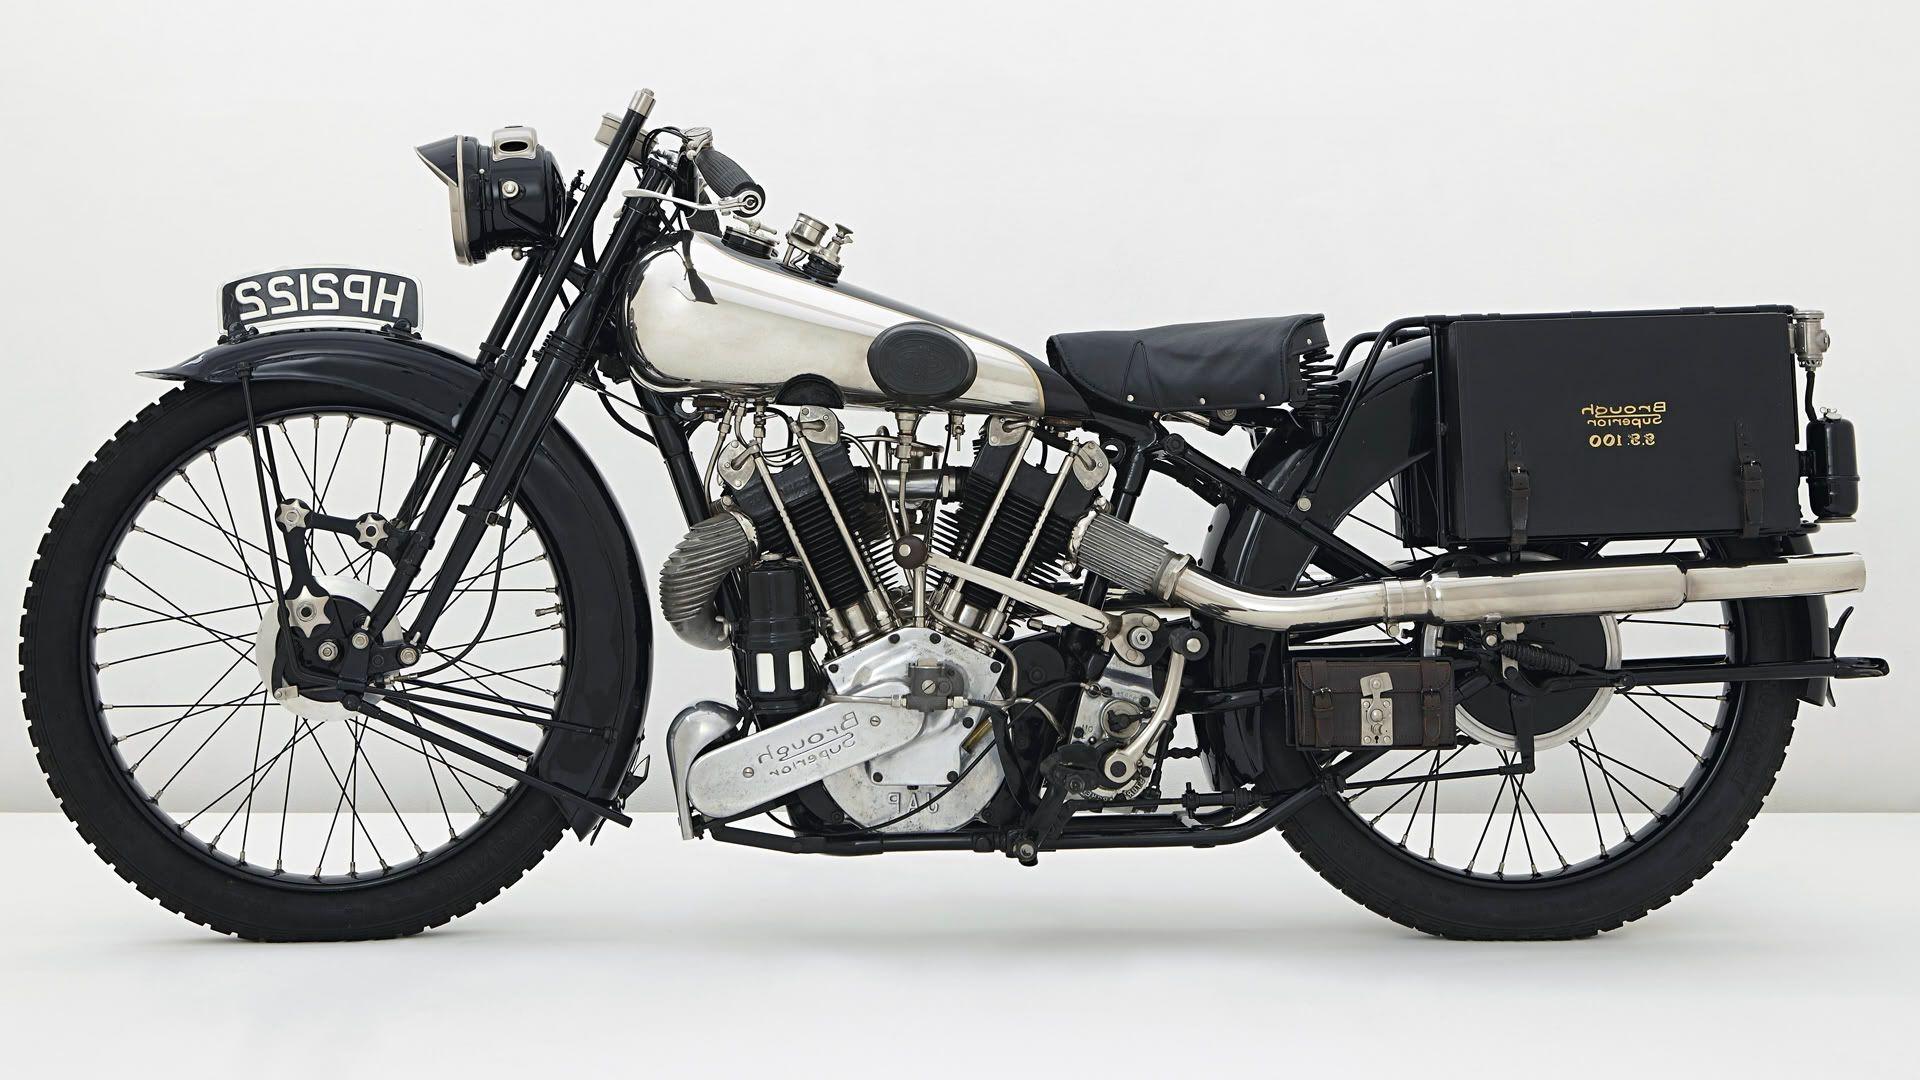 Vintage Motorcycle Wallpaper Images Motorcycle Wallpaper Vintage Motorcycle Motorcycle